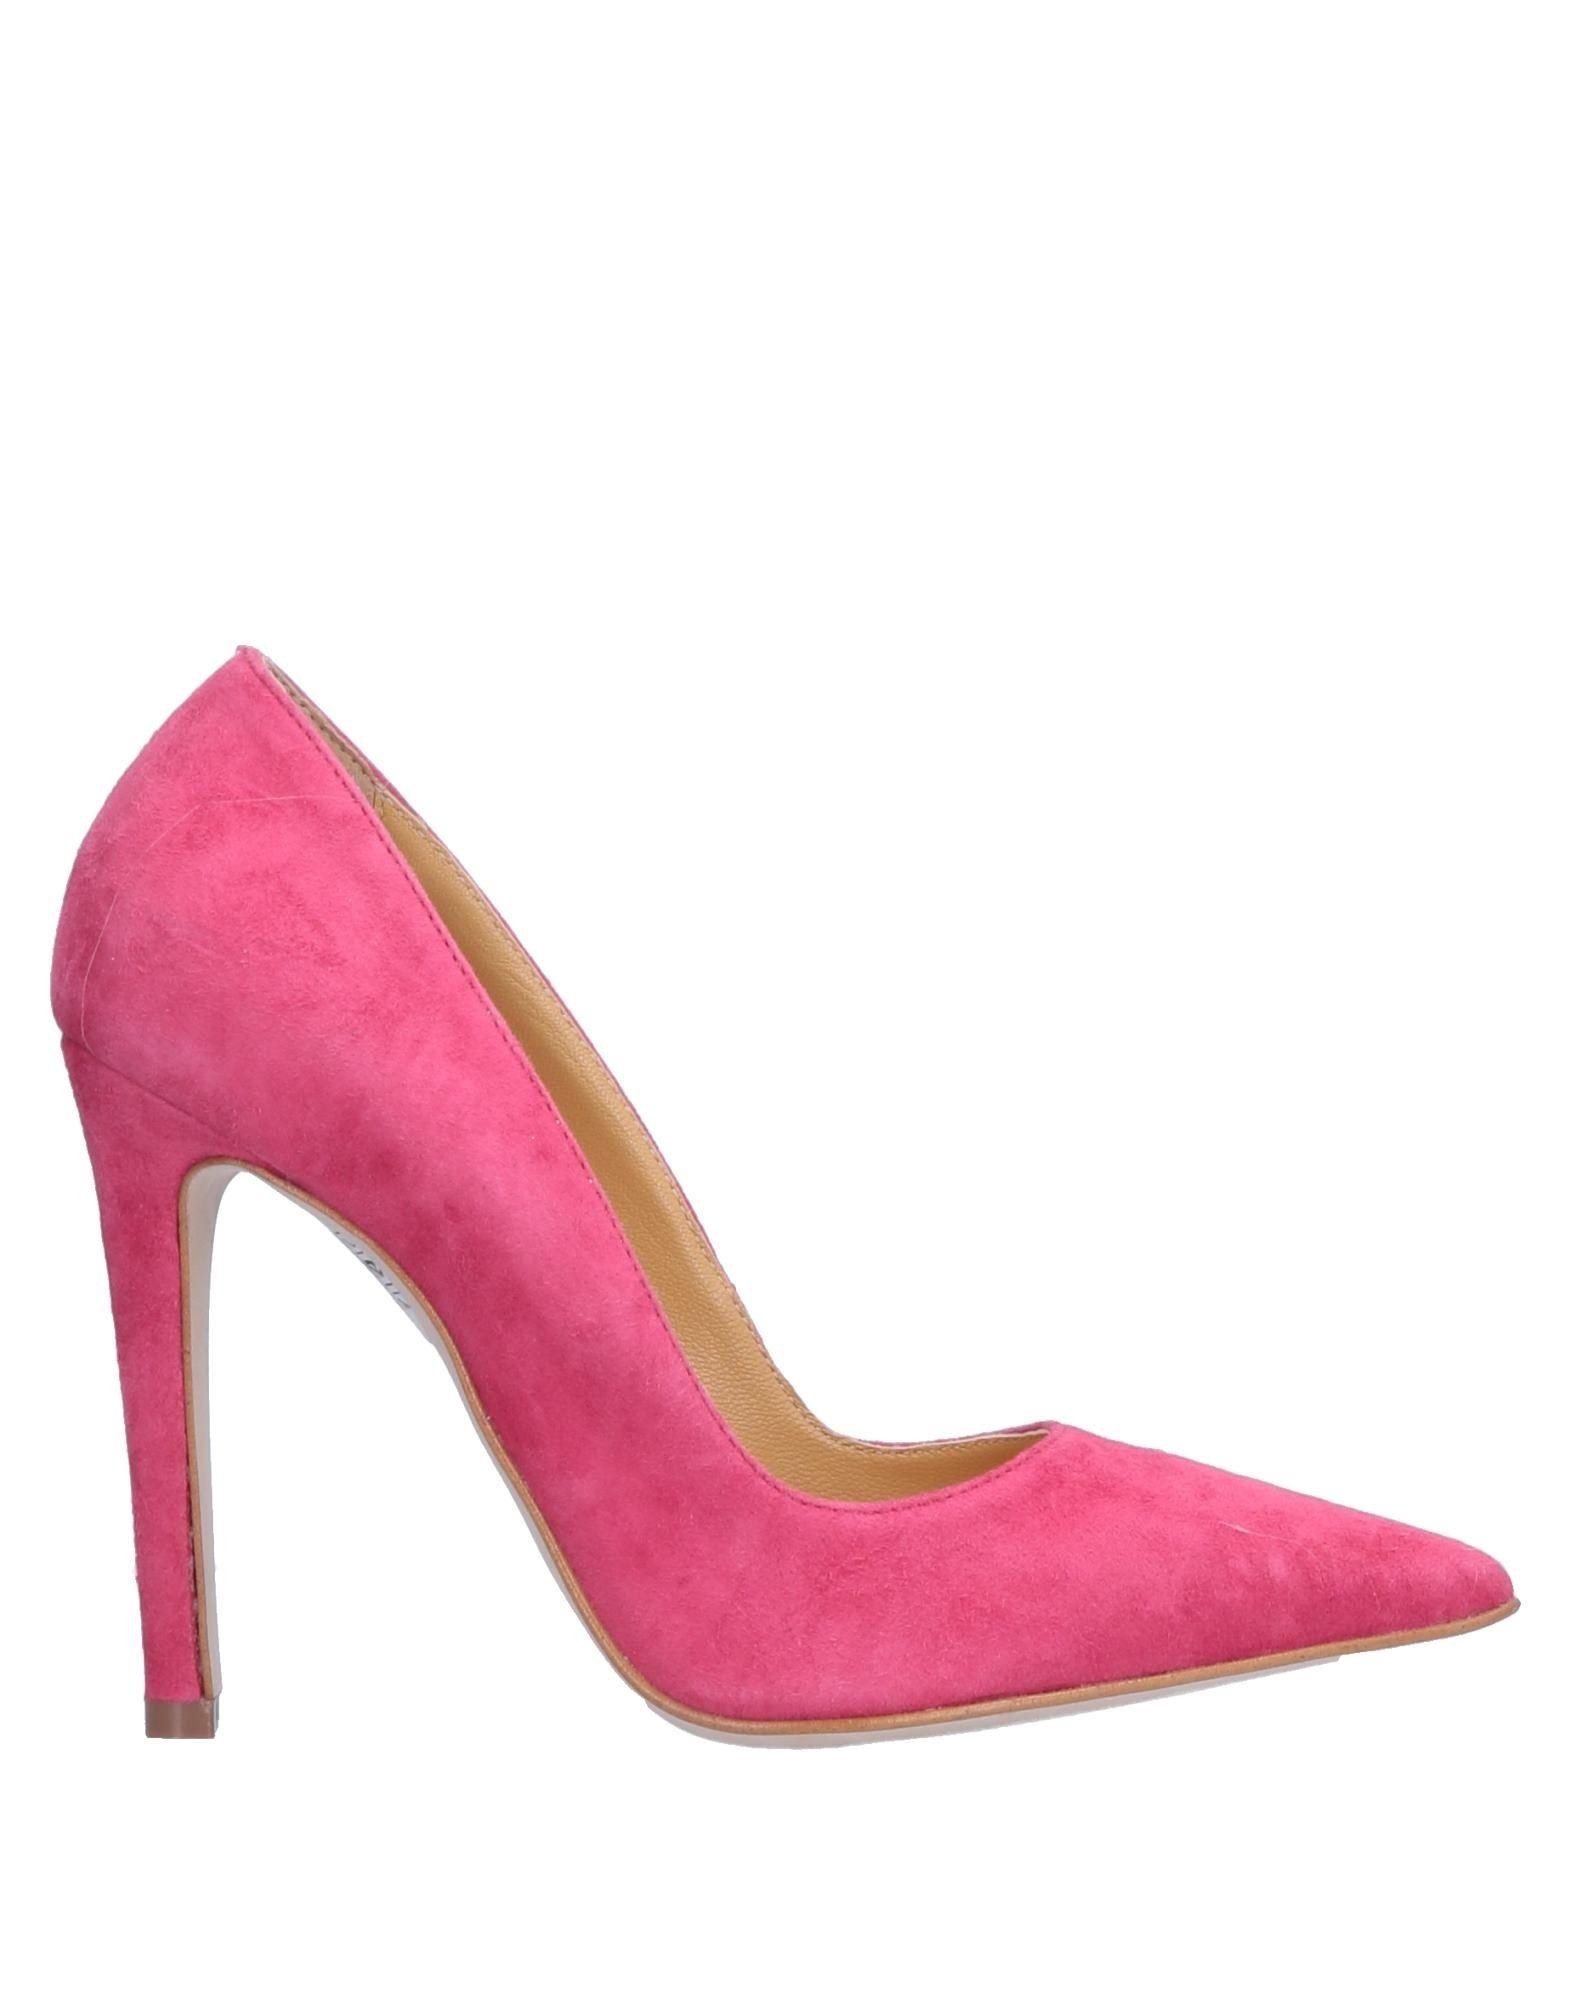 Sandali Nuove Desigual Donna - 11506296KE Nuove Sandali offerte e scarpe comode ba9aa9